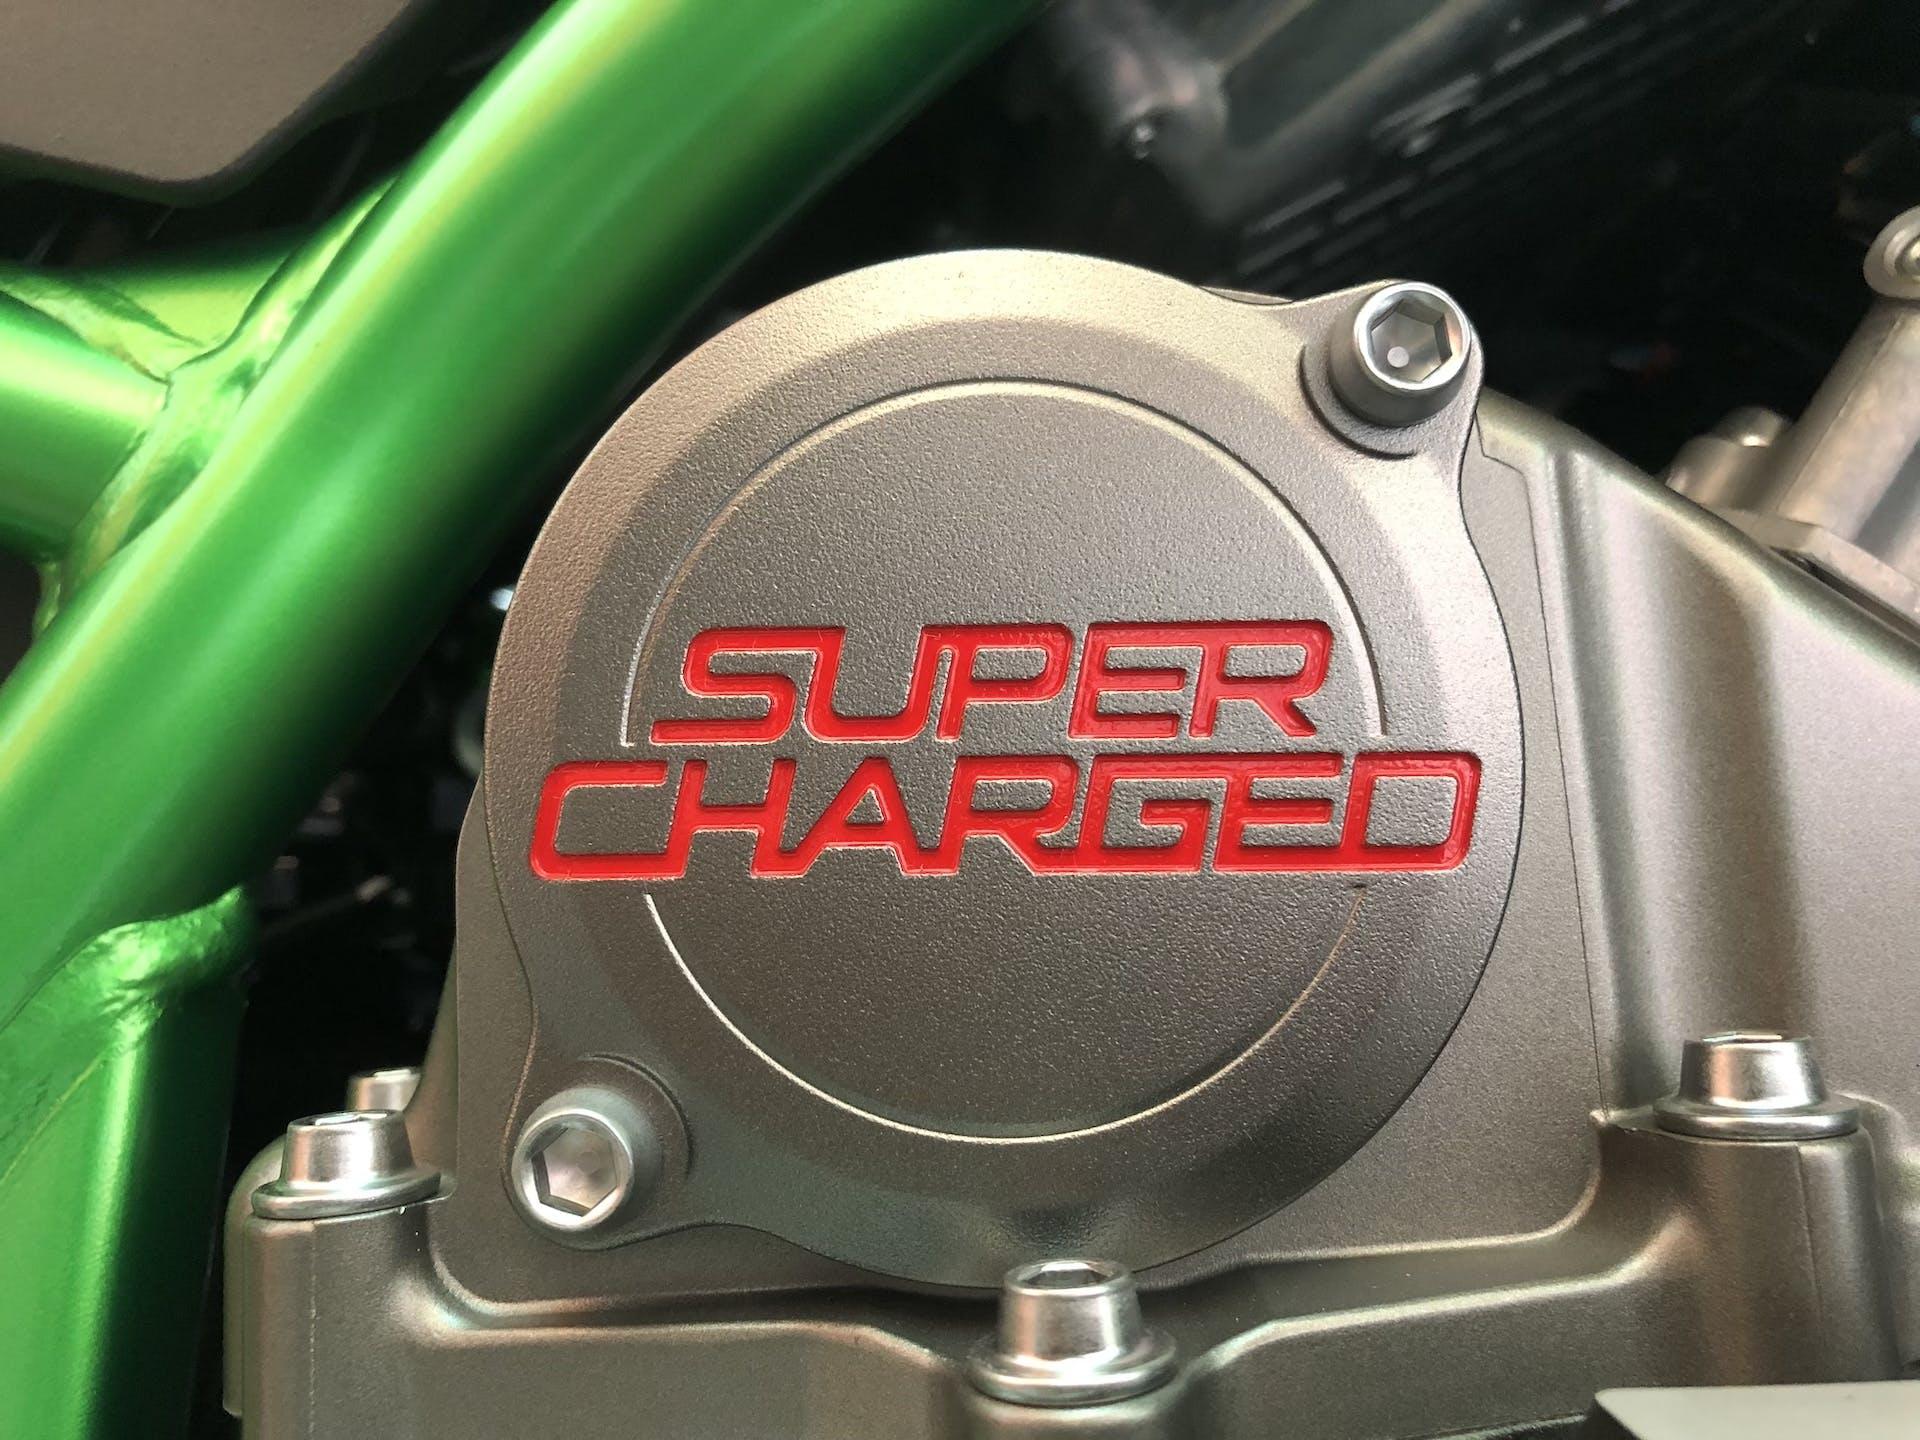 Supercharged Kawasaki Z H2 SE